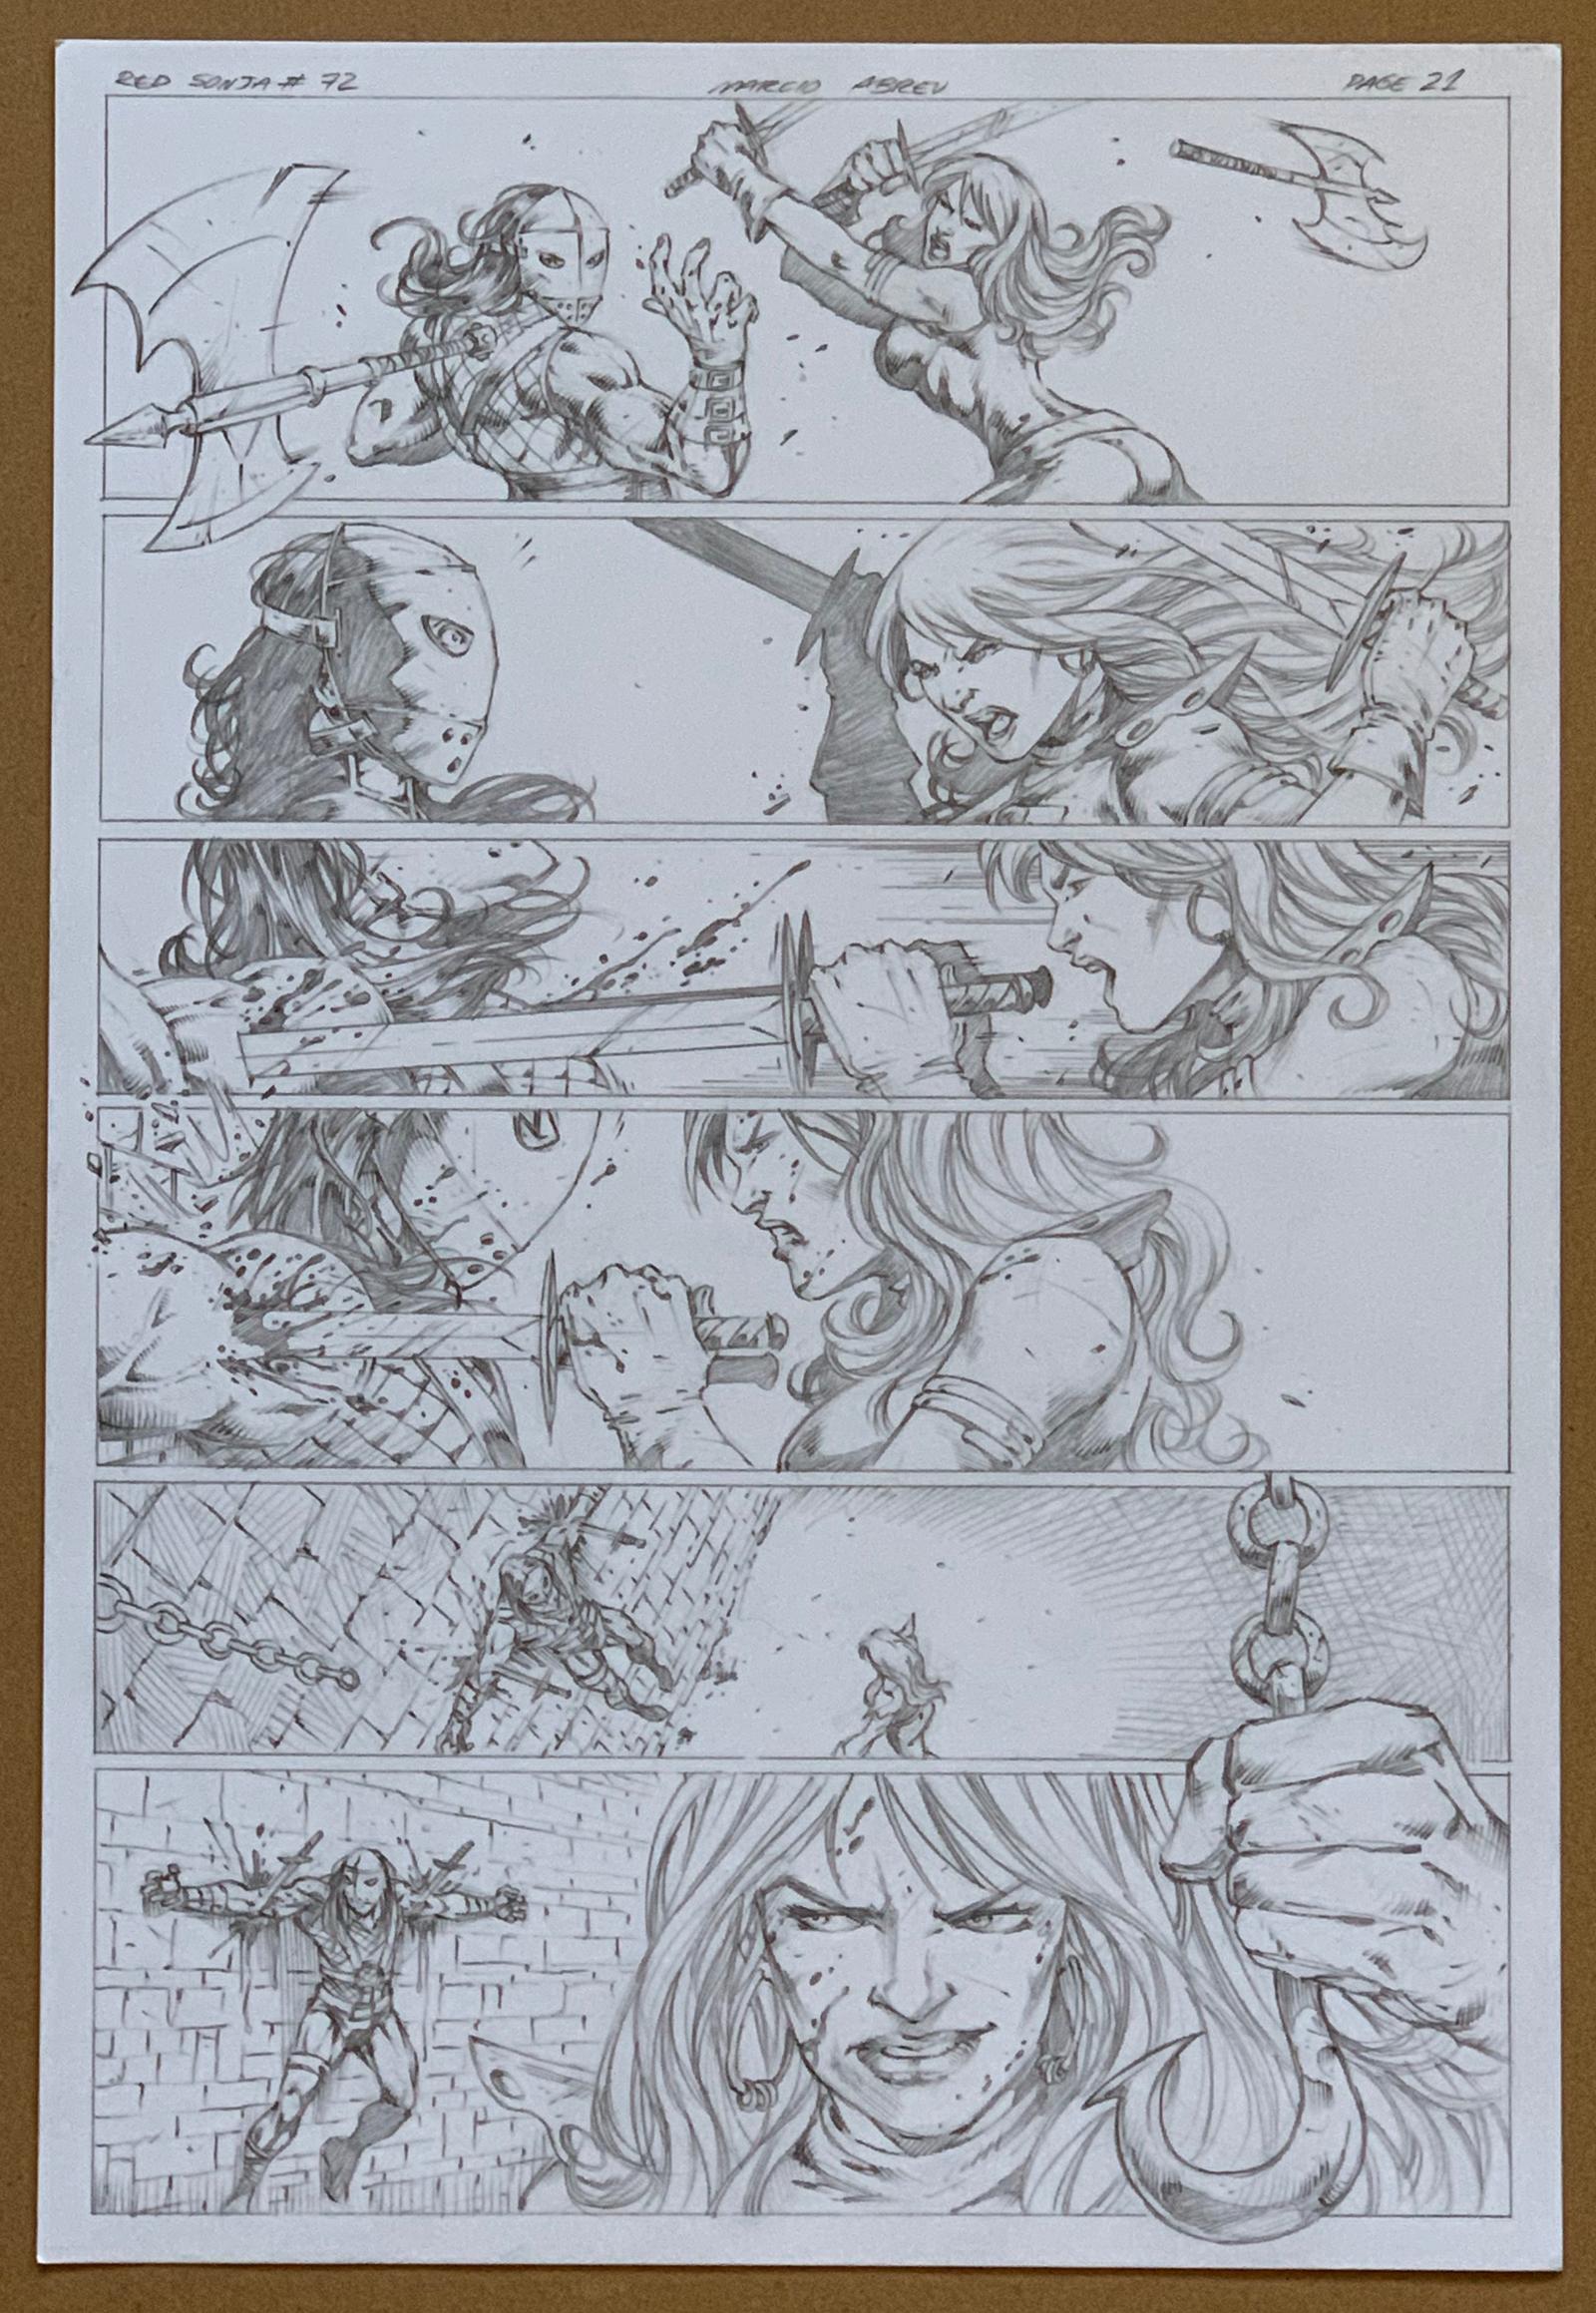 Lot 2015 - RED SONJA #72 (2012) - ORIGINAL ARTWORK - MARCIO ABREU (Artist) - Page 21 (DYNAMITE 2012) - Red